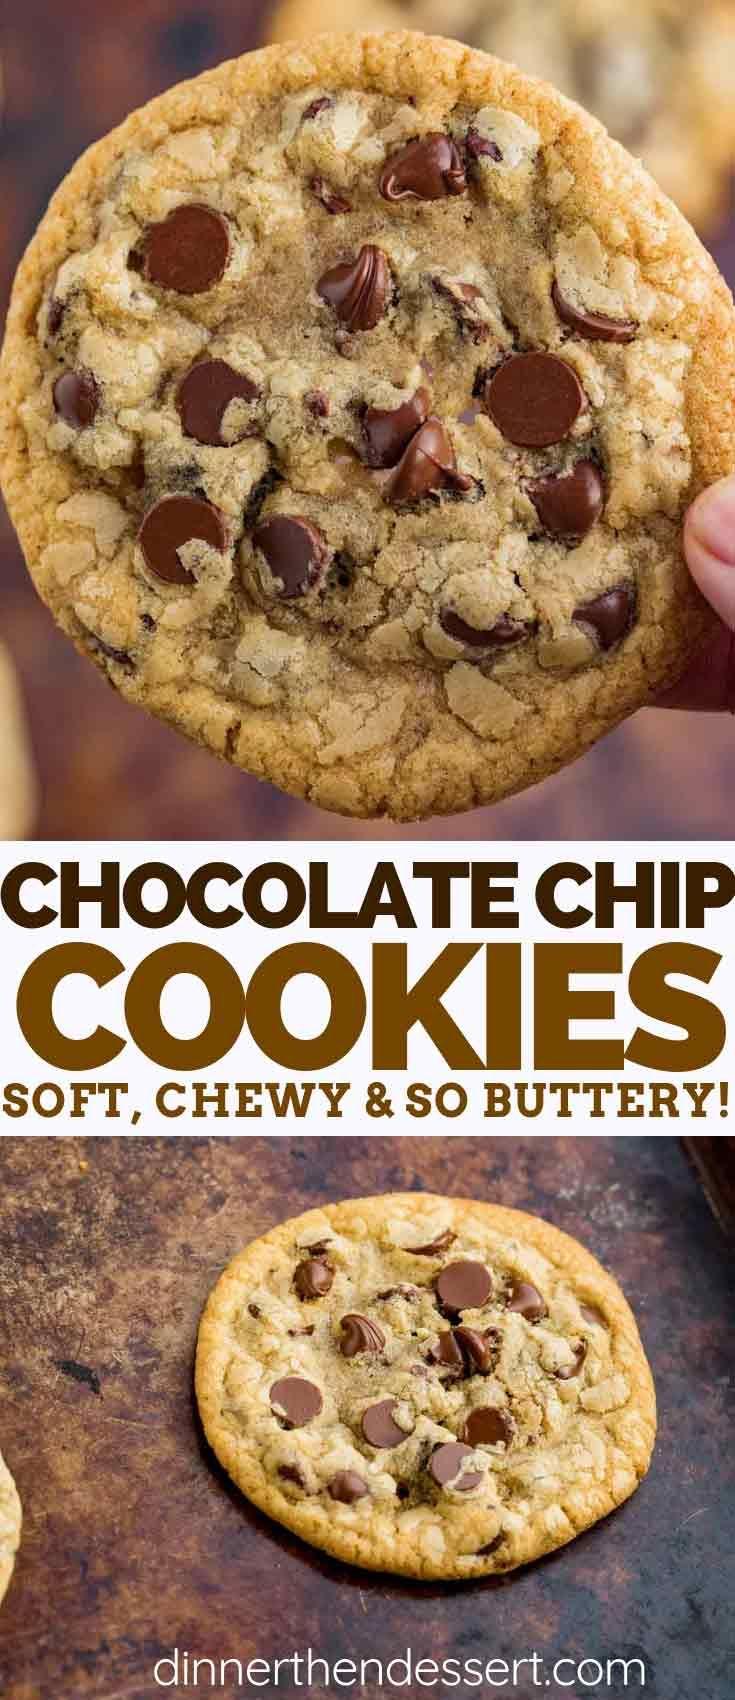 Chocolate Chip Cookies - Dinner, then Dessert